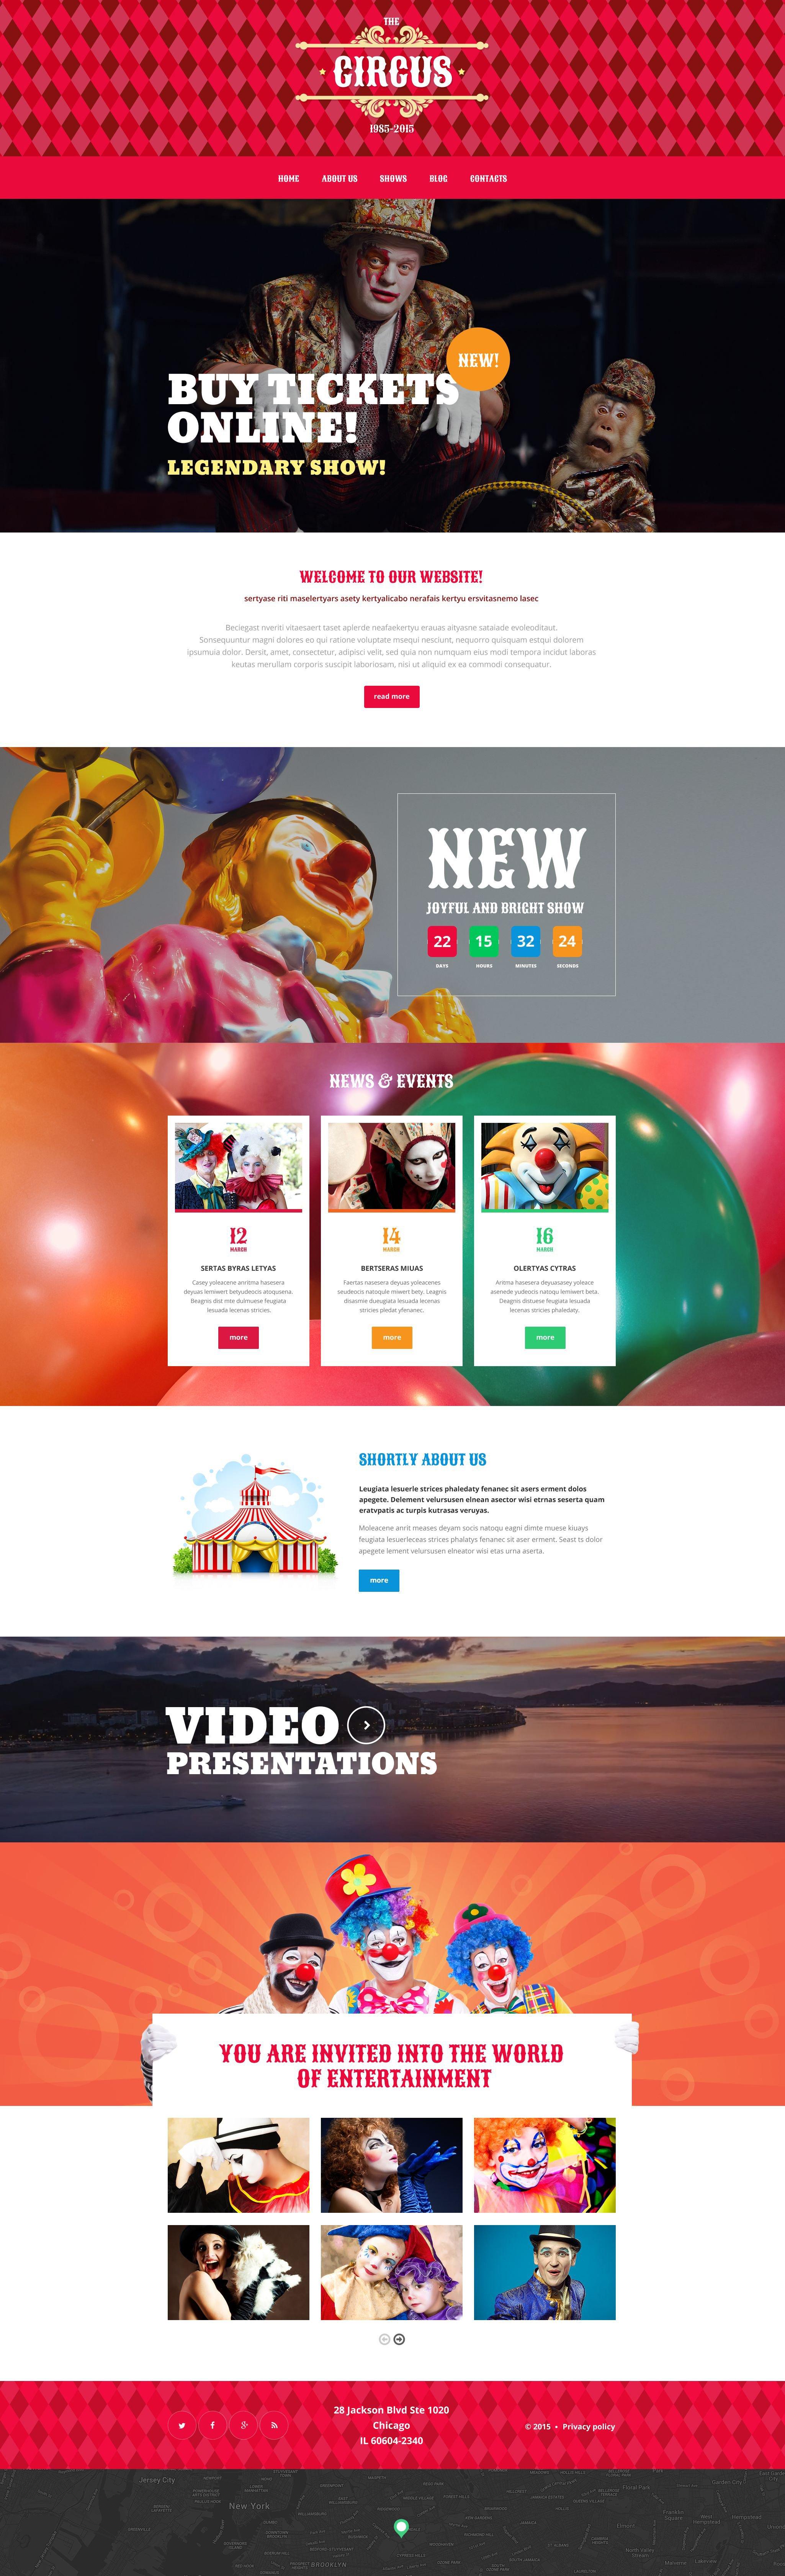 Responsivt Circus Tent WordPress-tema #55589 - skärmbild